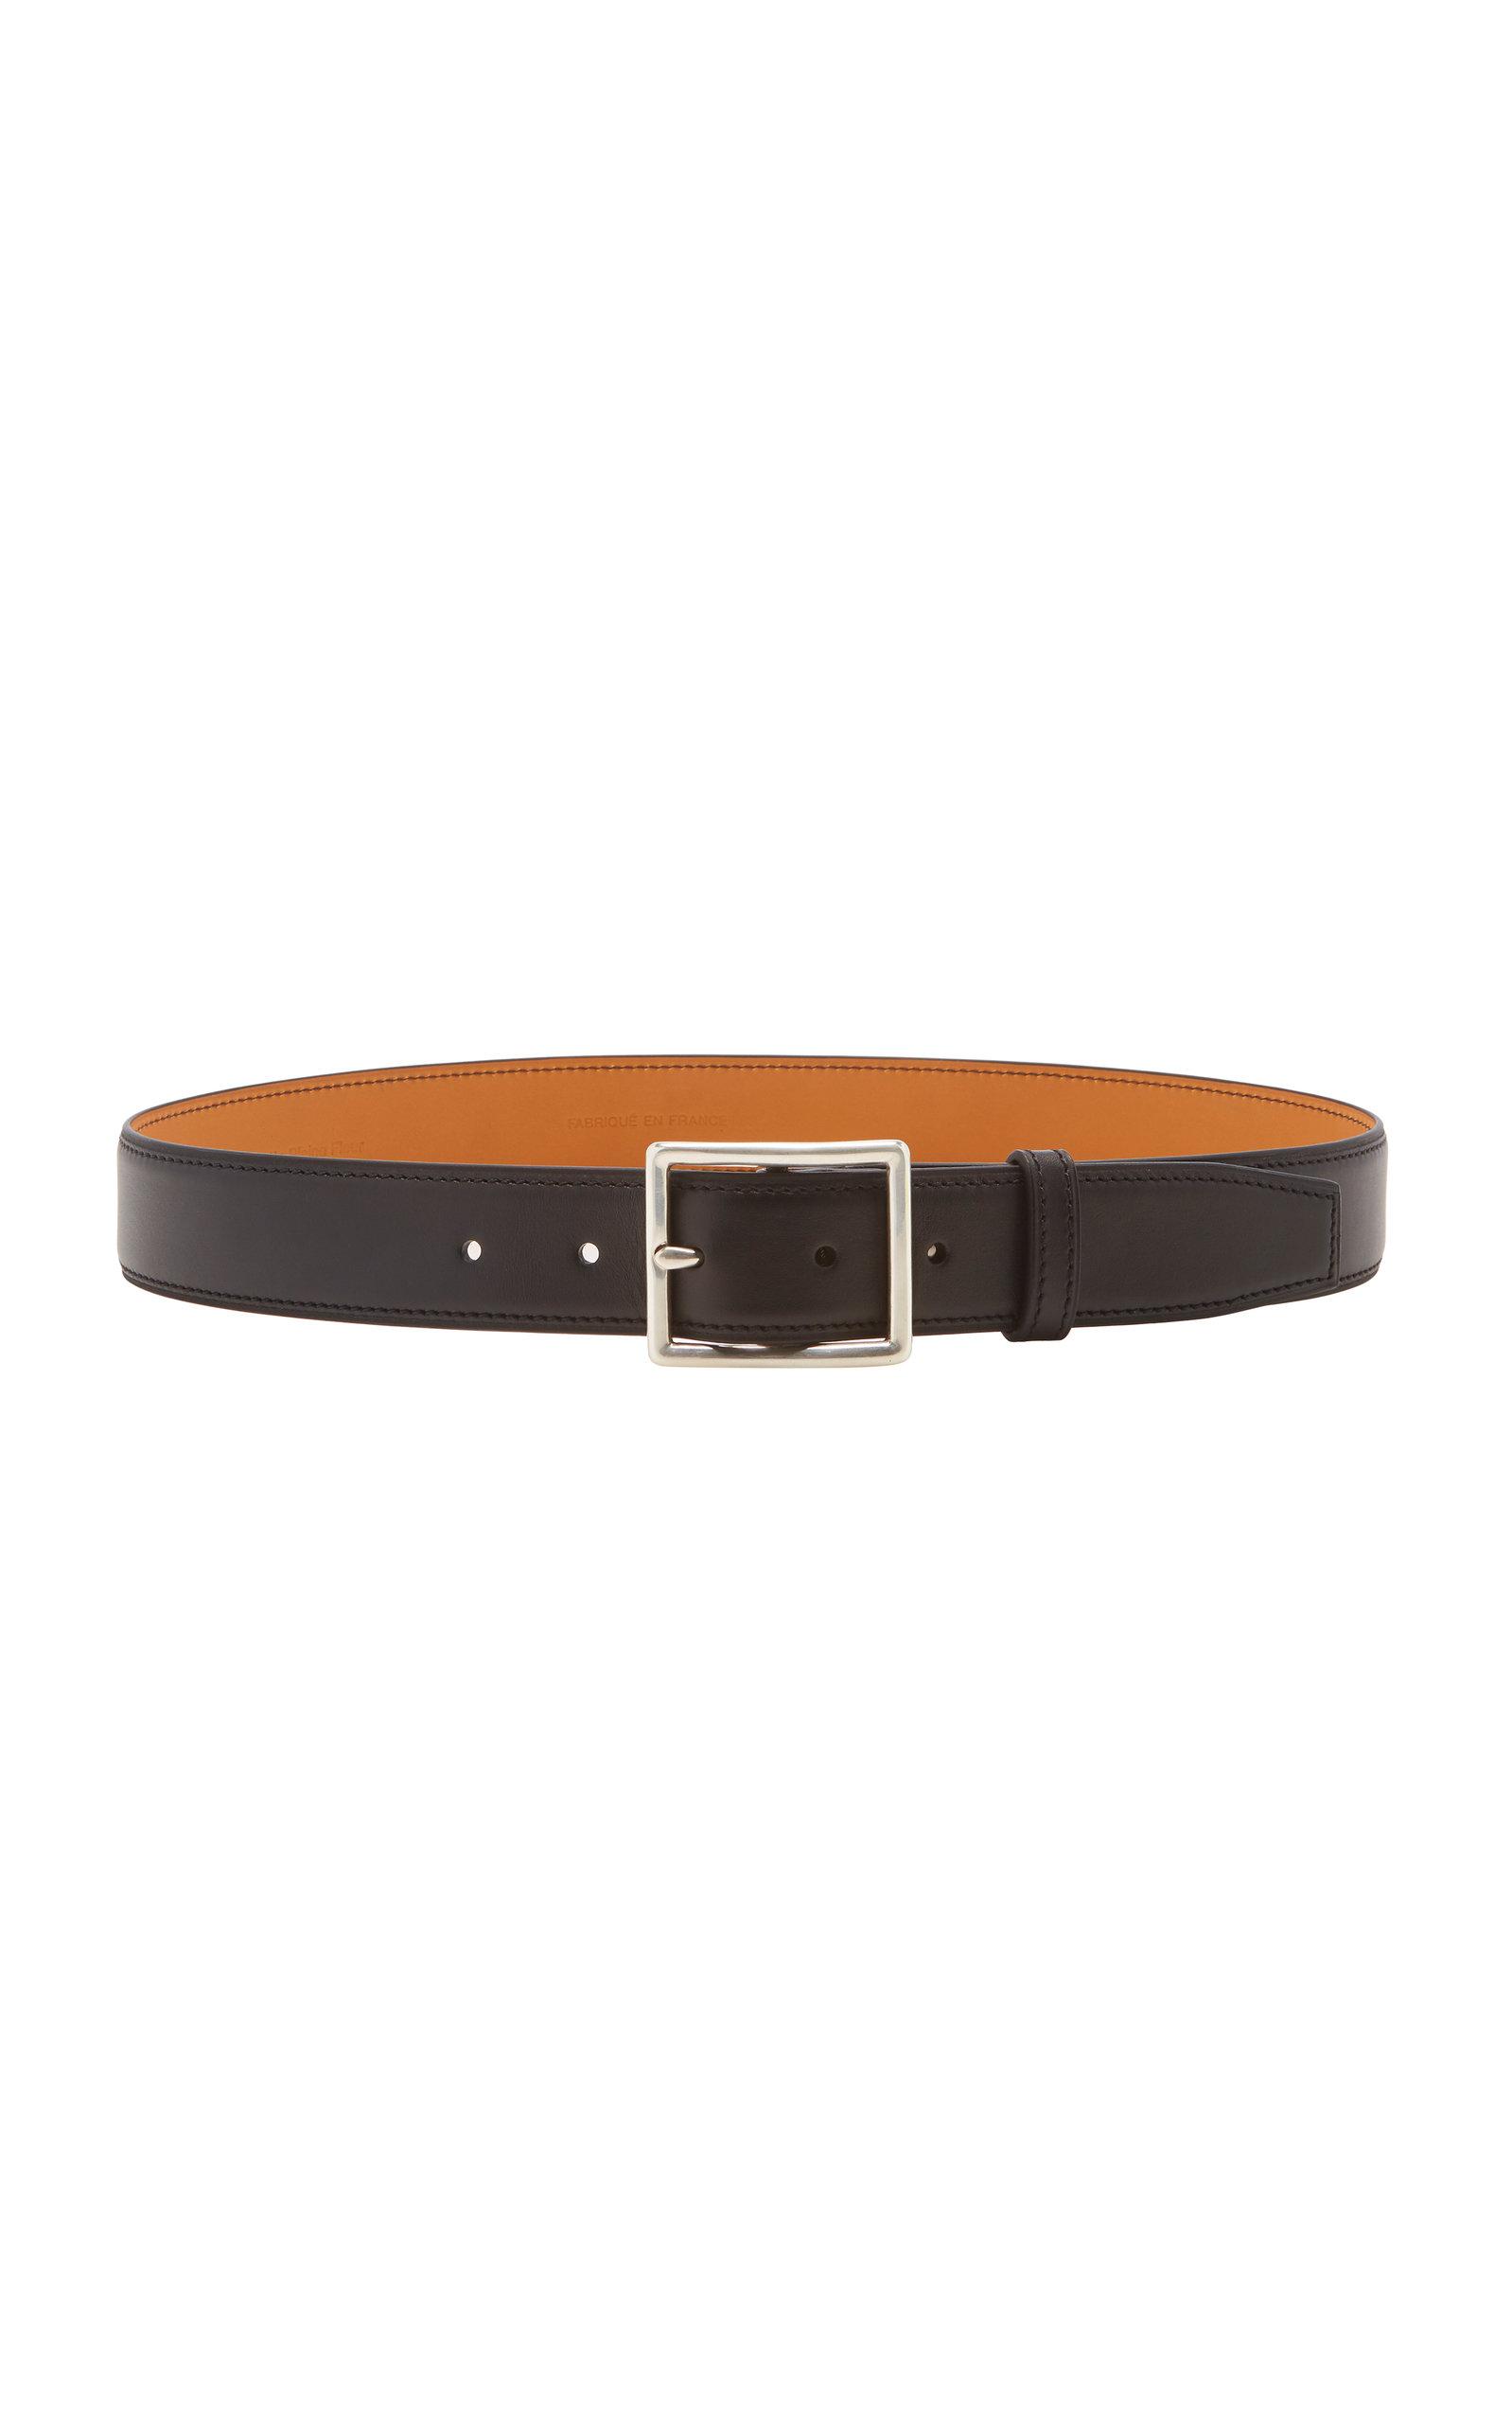 MO exclusive Leather Waist Belt Maison Vaincourt GdFo1